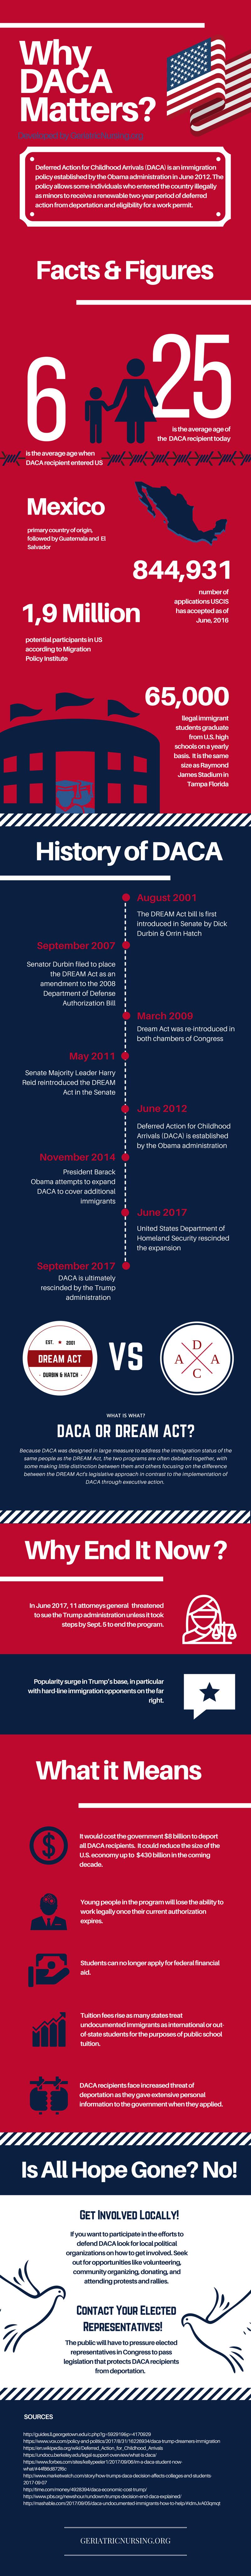 Why DACA Matters